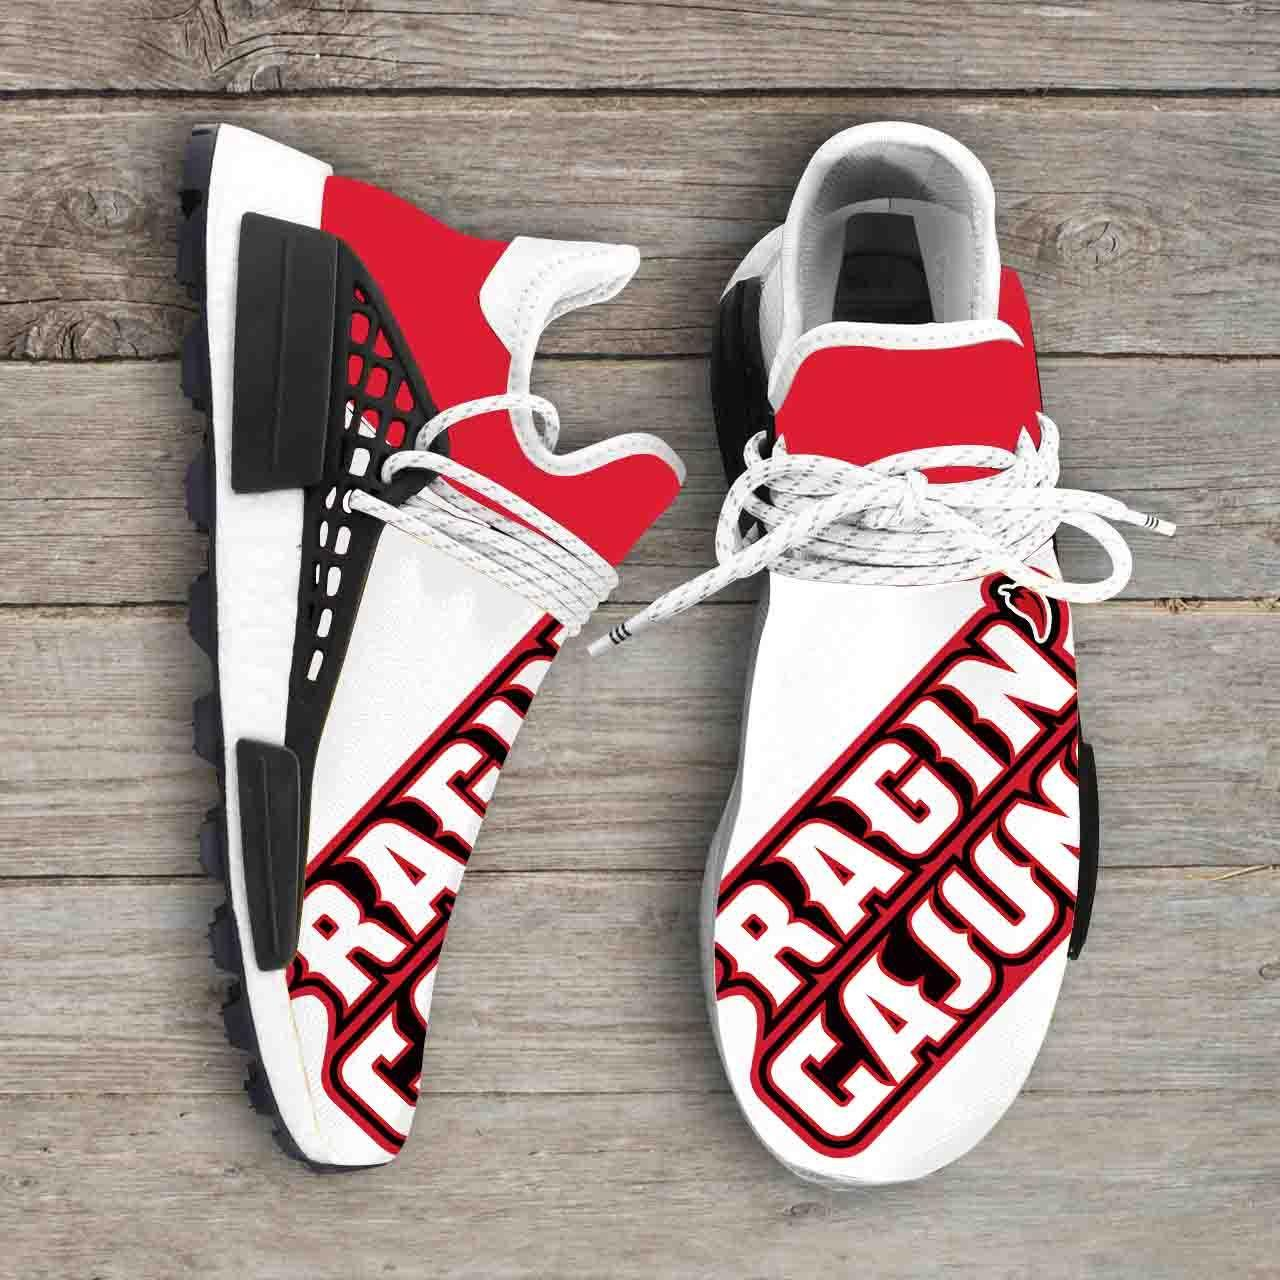 Louisiana Ragin Cajuns Ncaa NMD Human Shoes